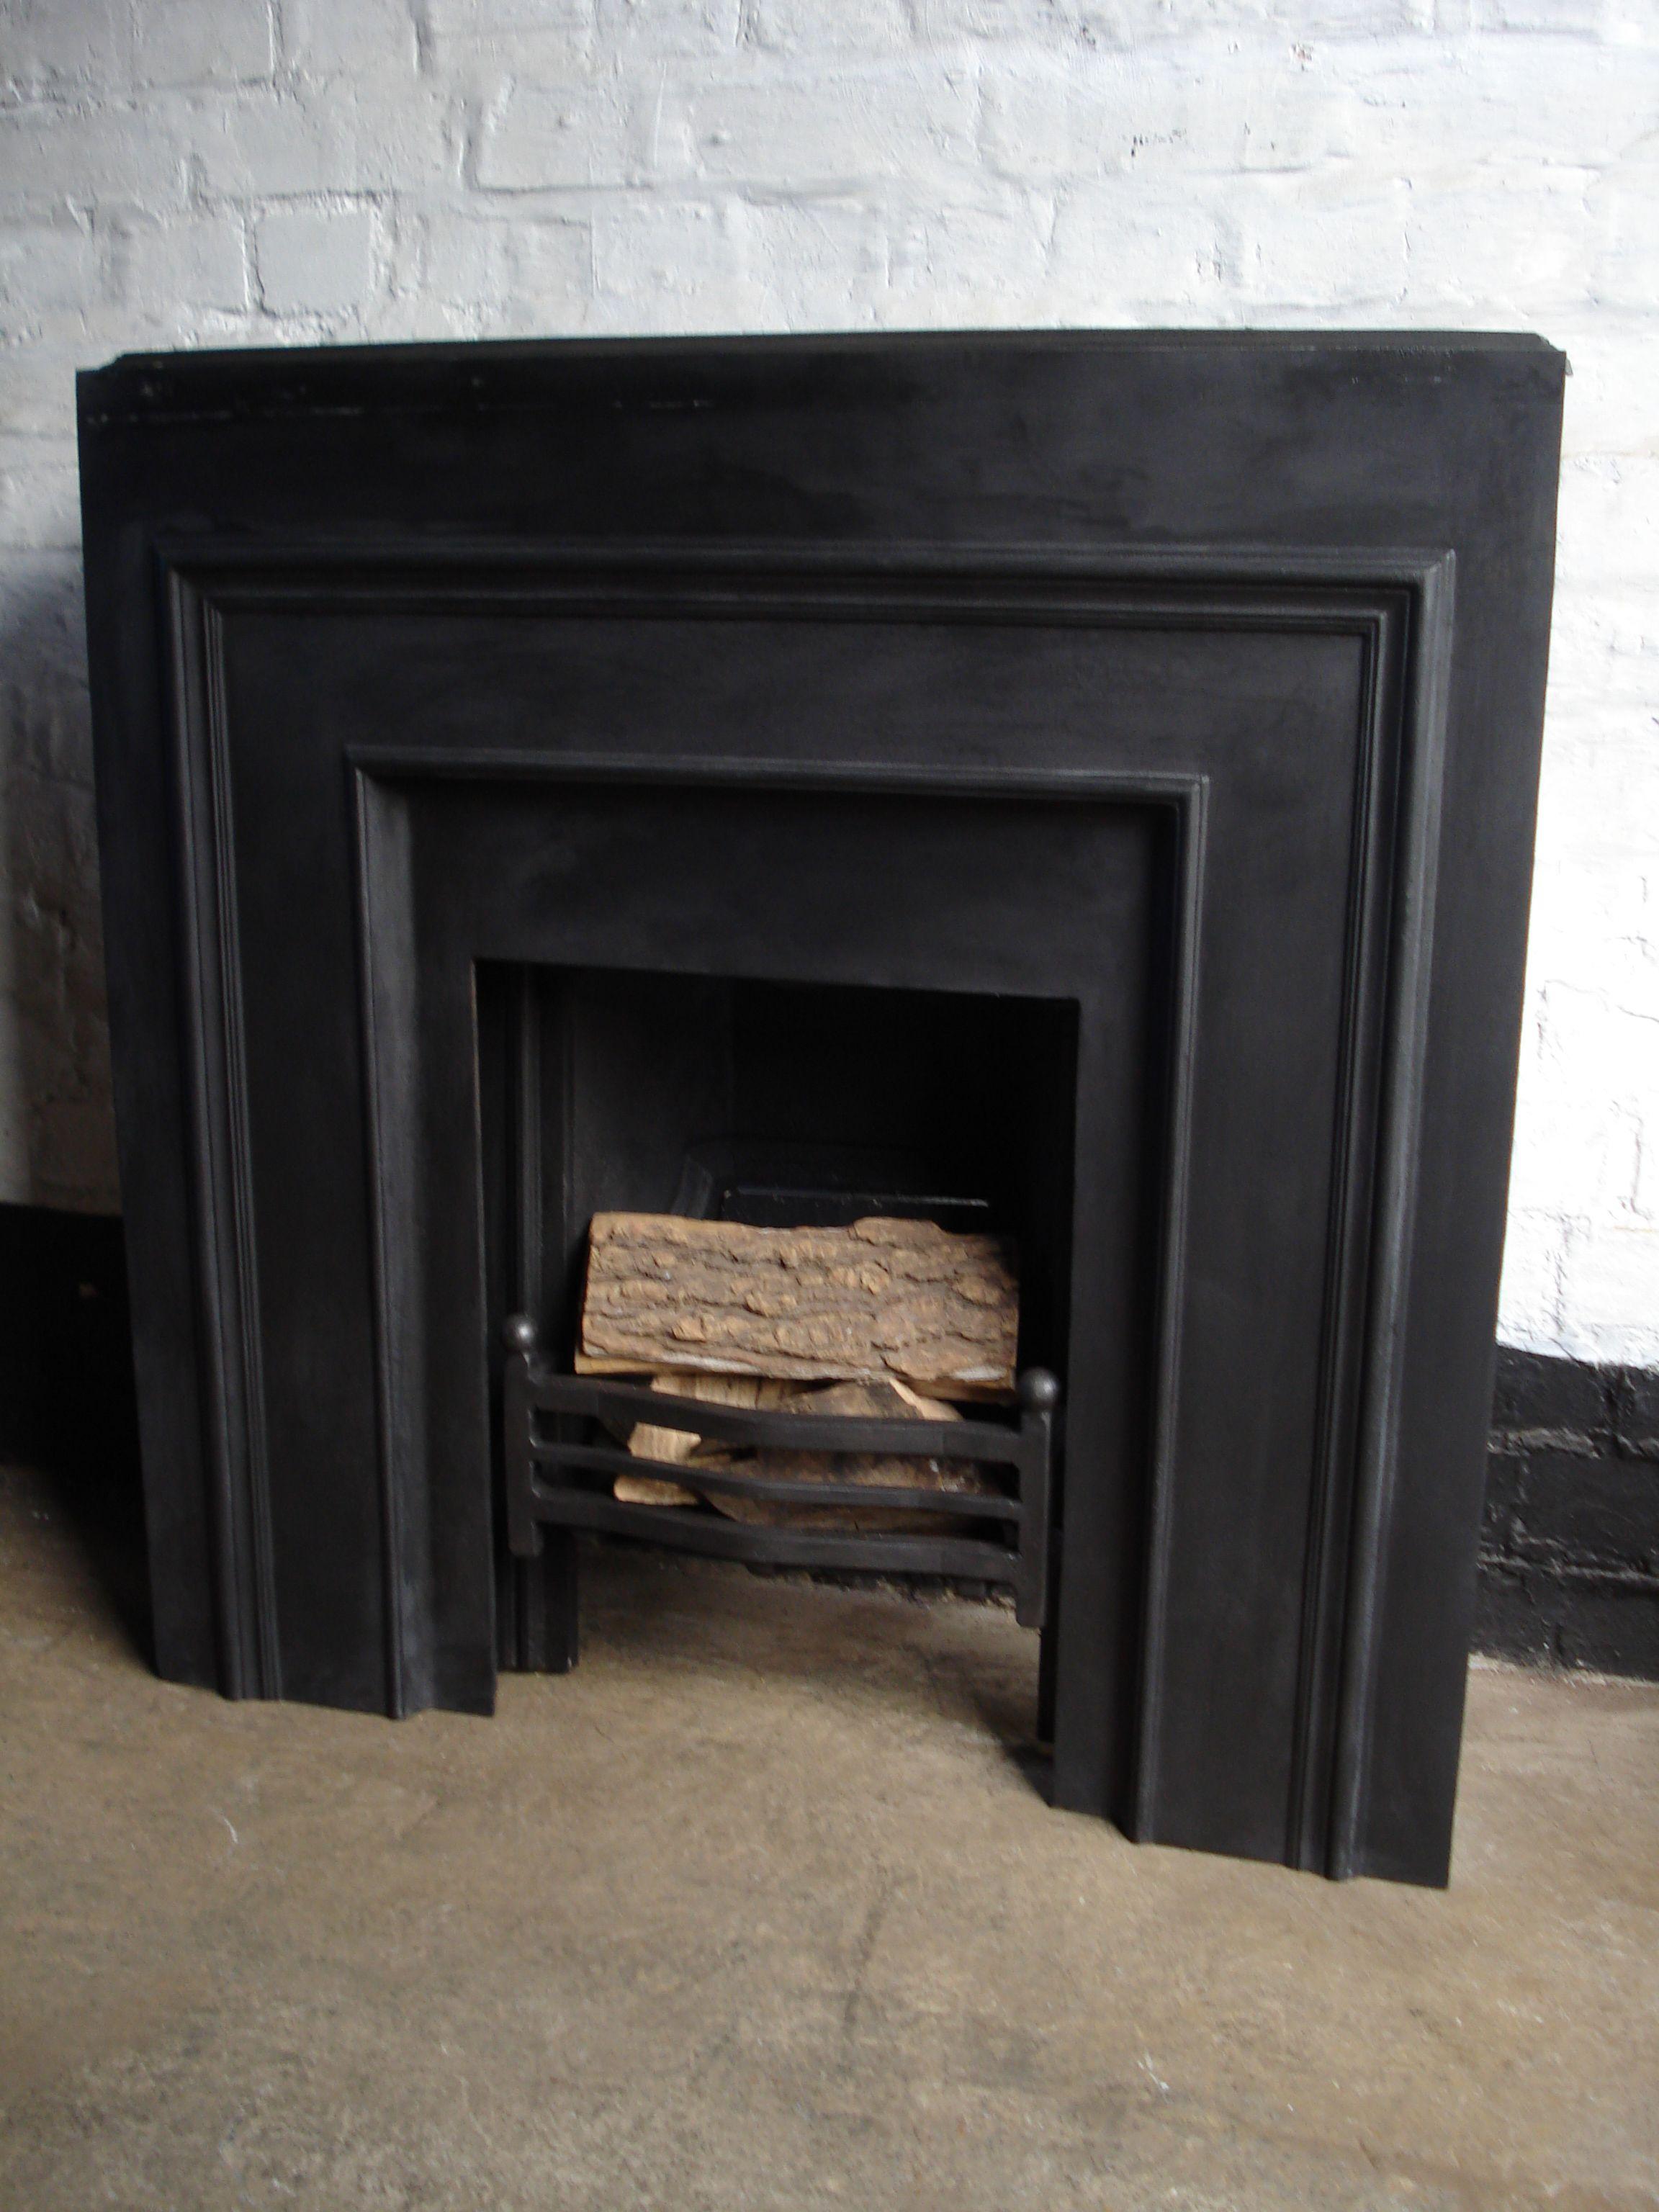 Cast Iron Fire Insert Back Panel Original Fires Fireplace Granite Hearth Oak Fire Surround